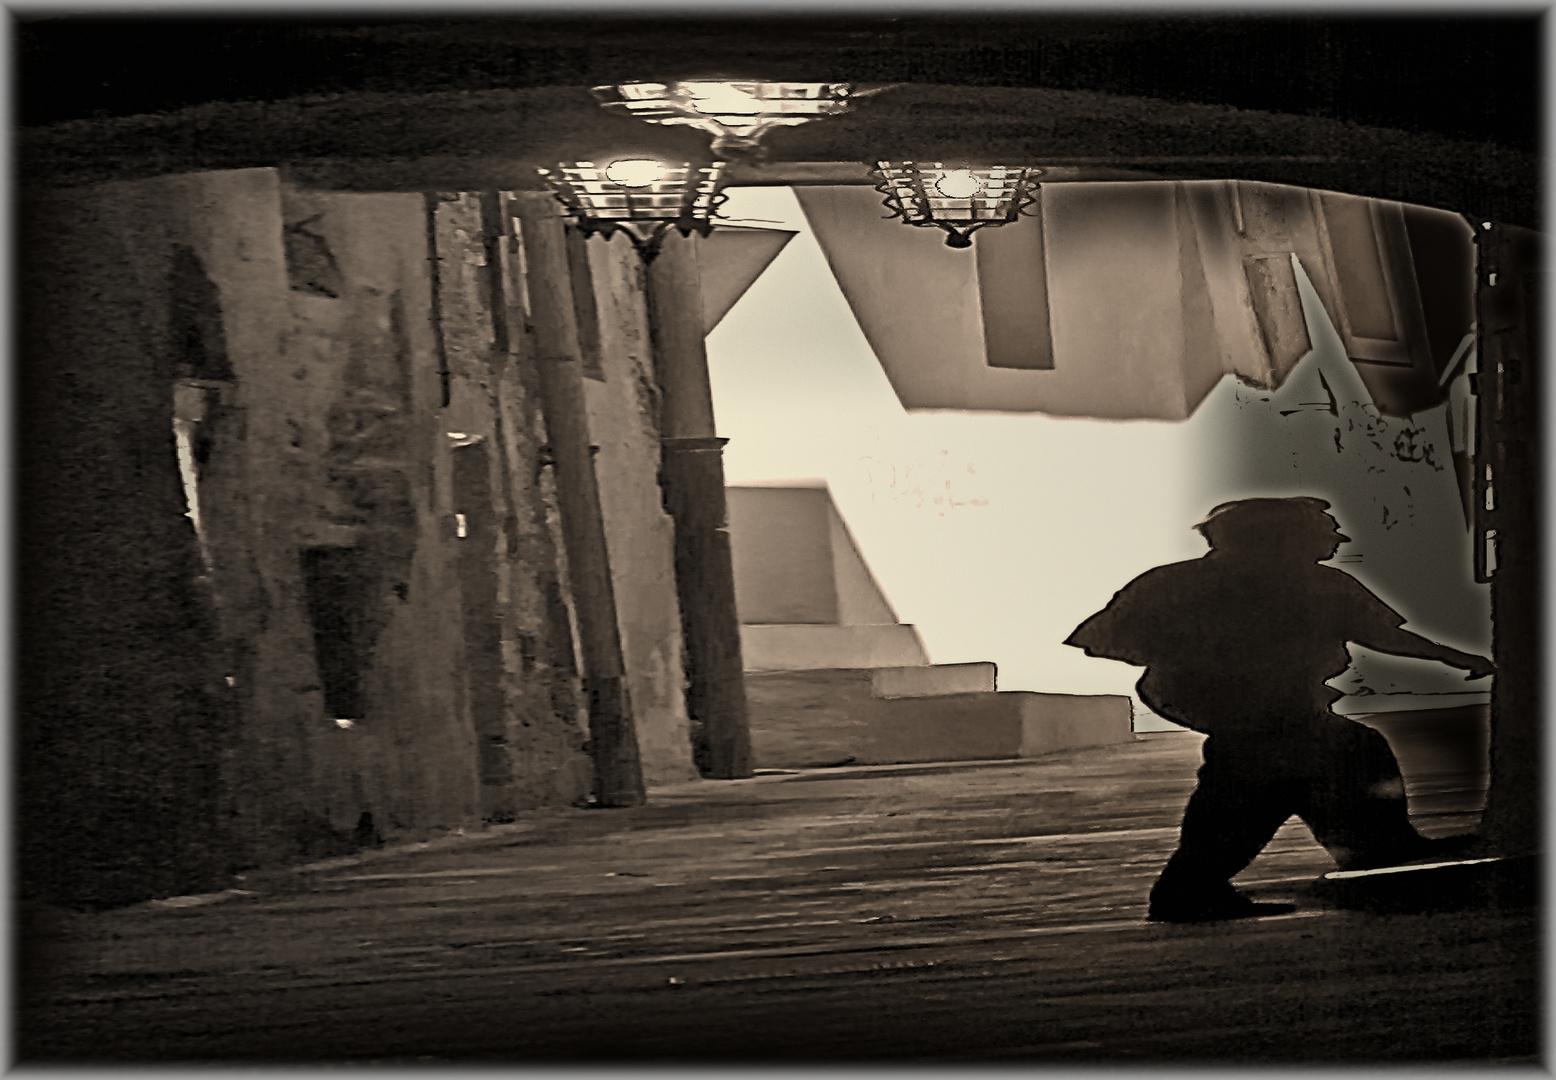 Sombra en Fuga